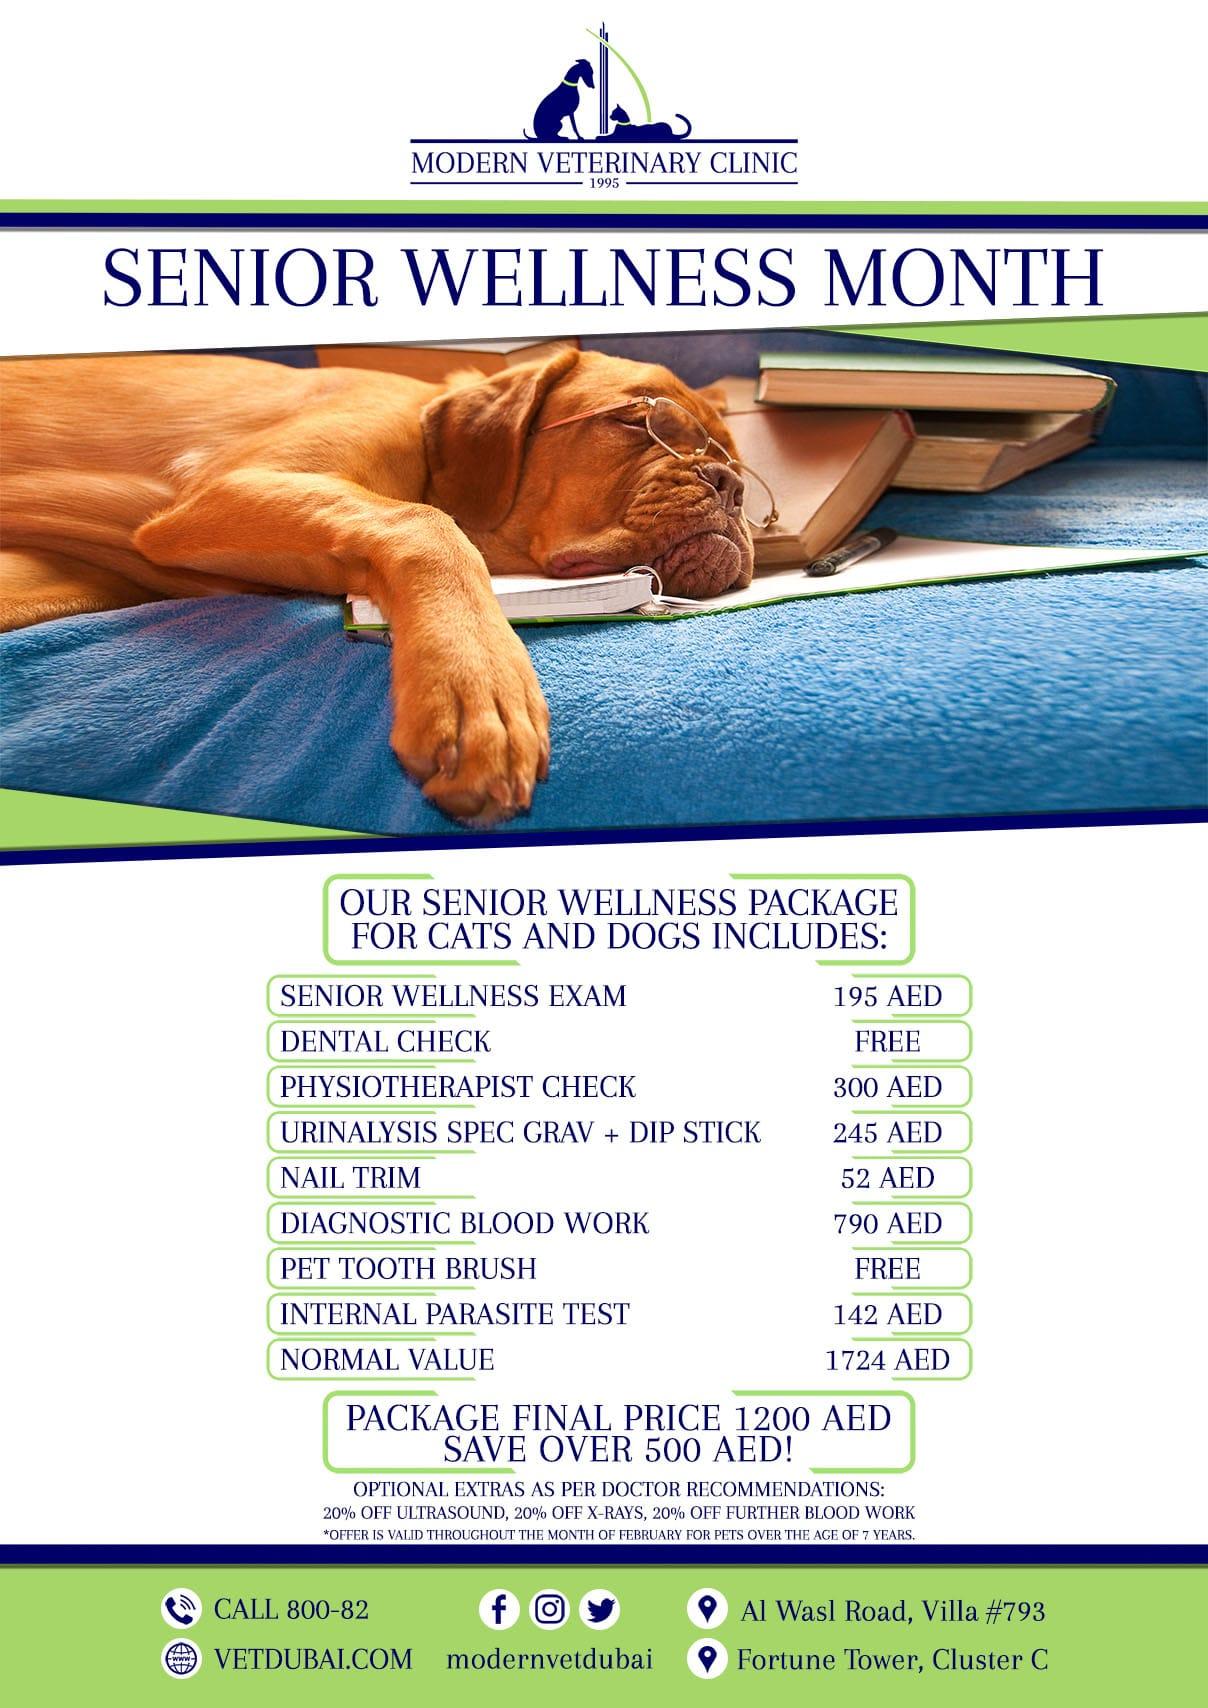 Senior Wellness Pakcage